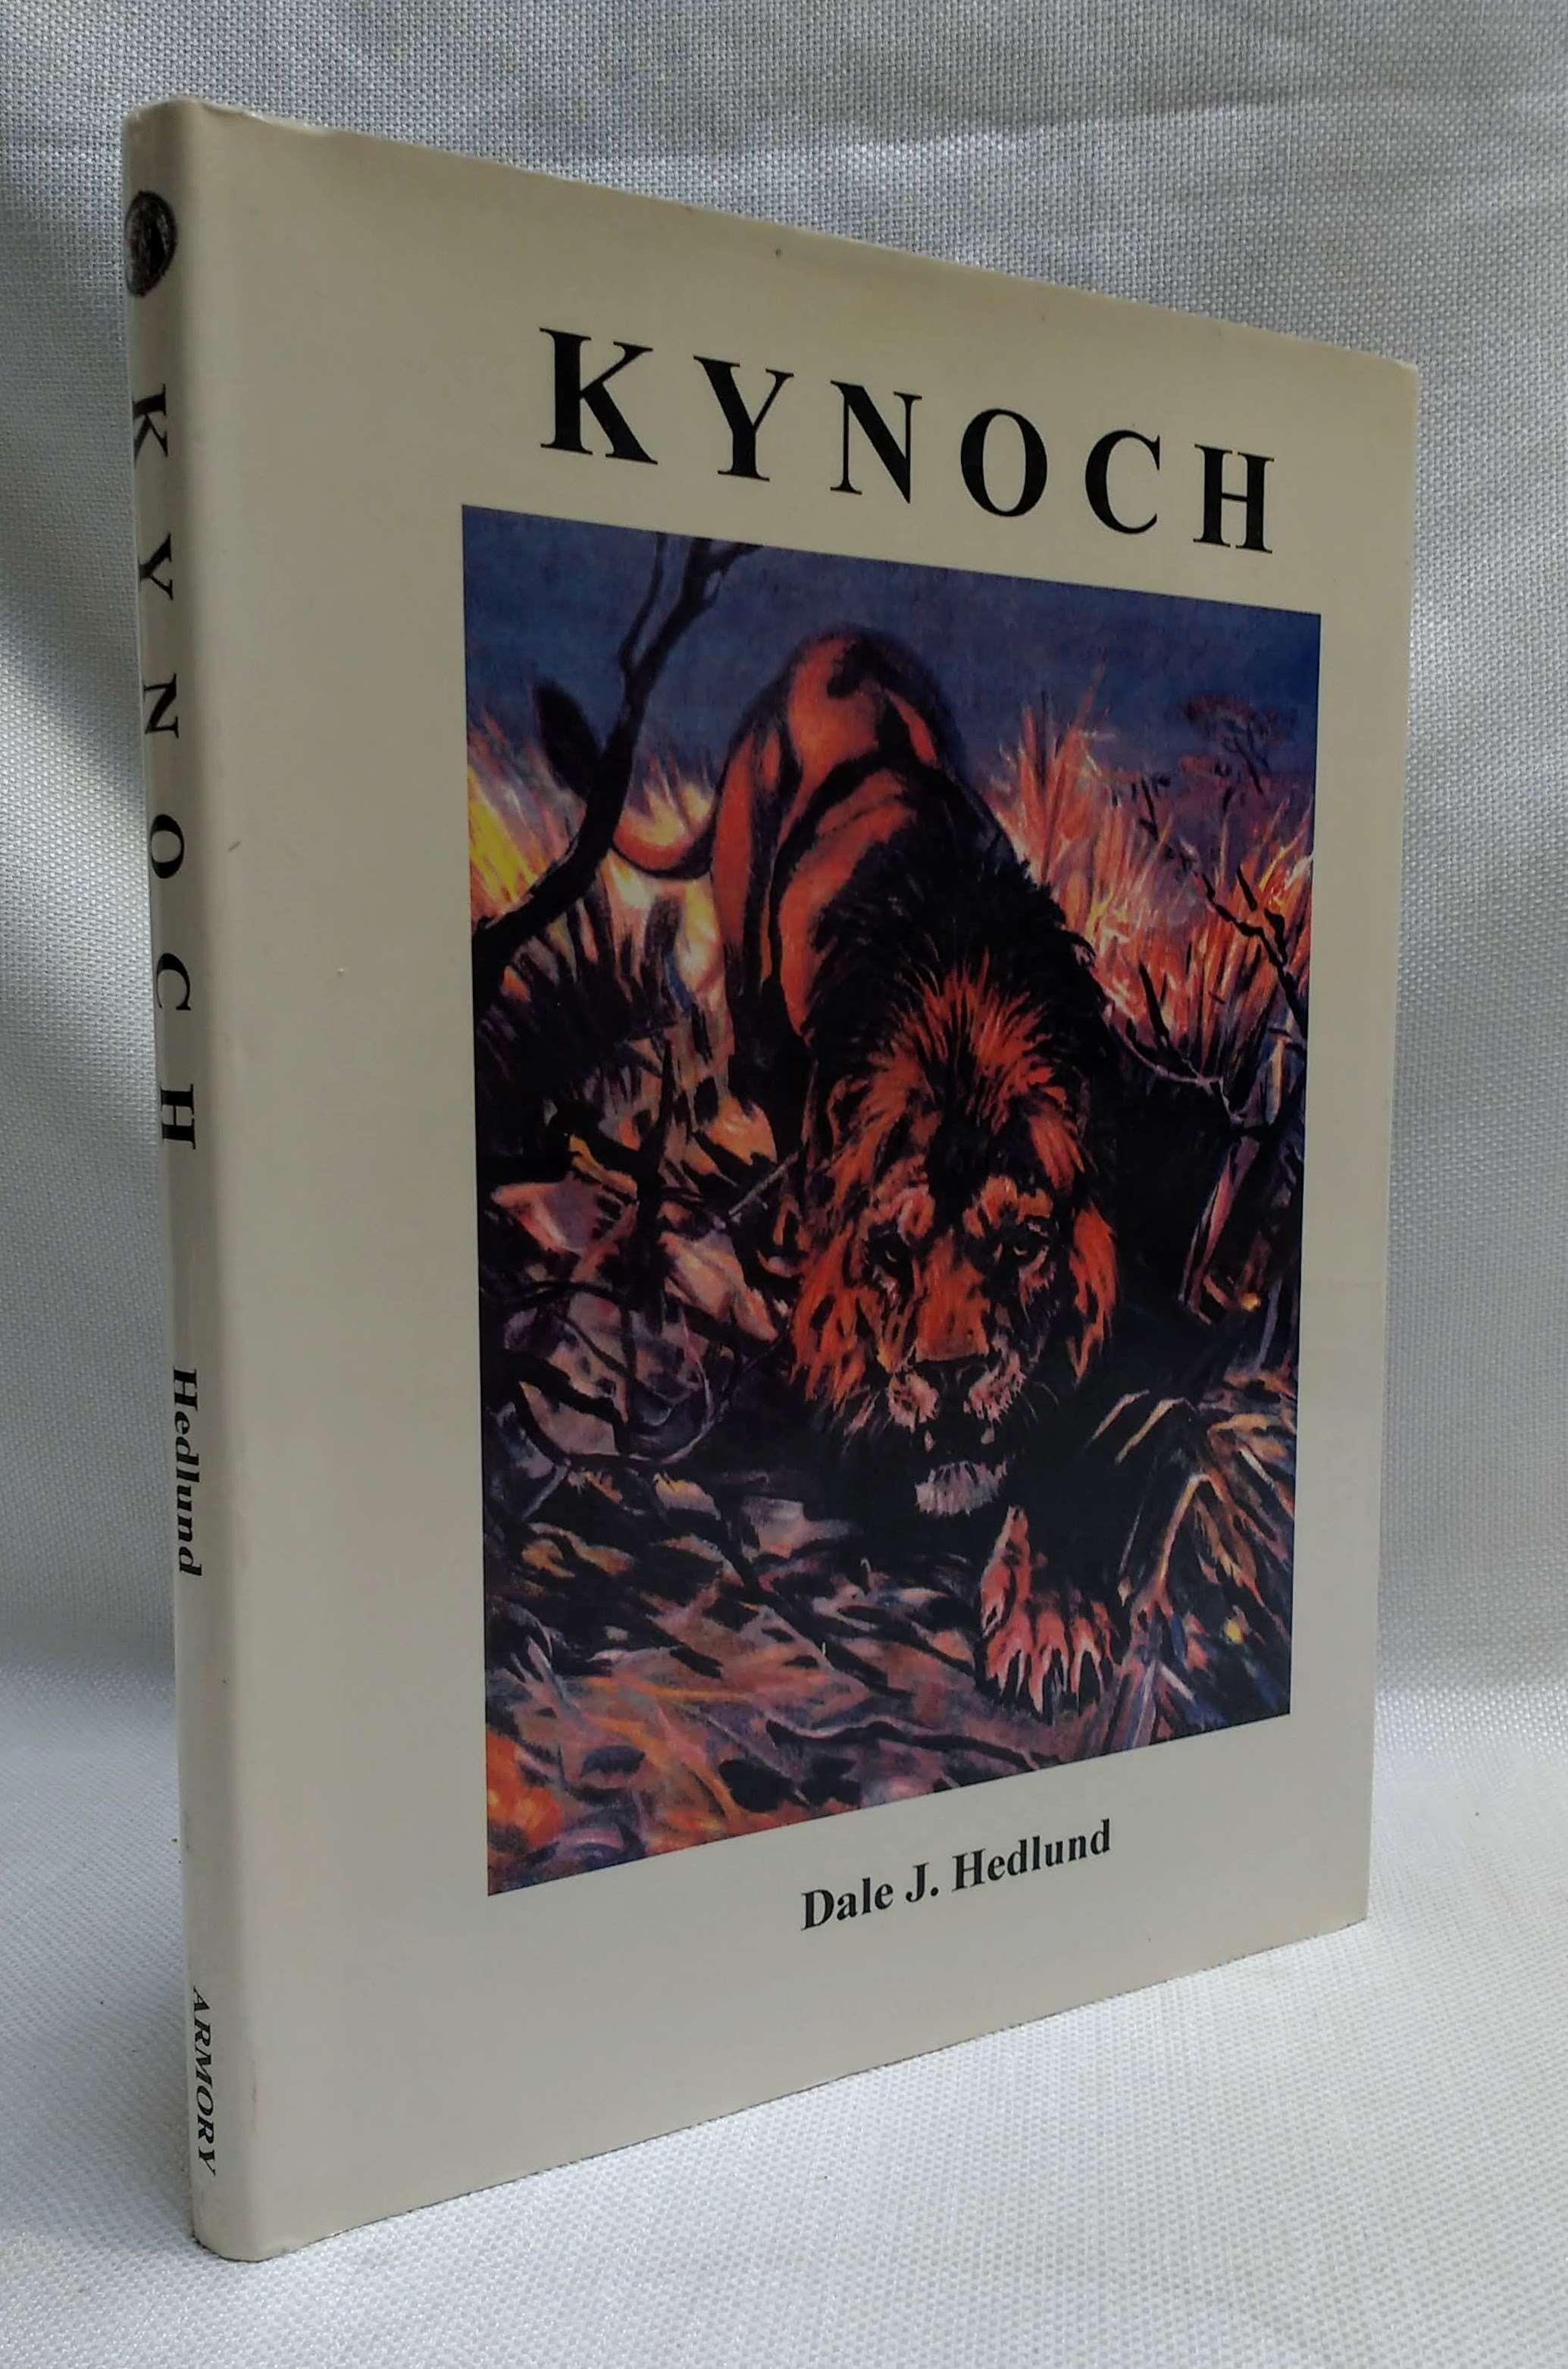 Kynoch, Dale J. Hedlund